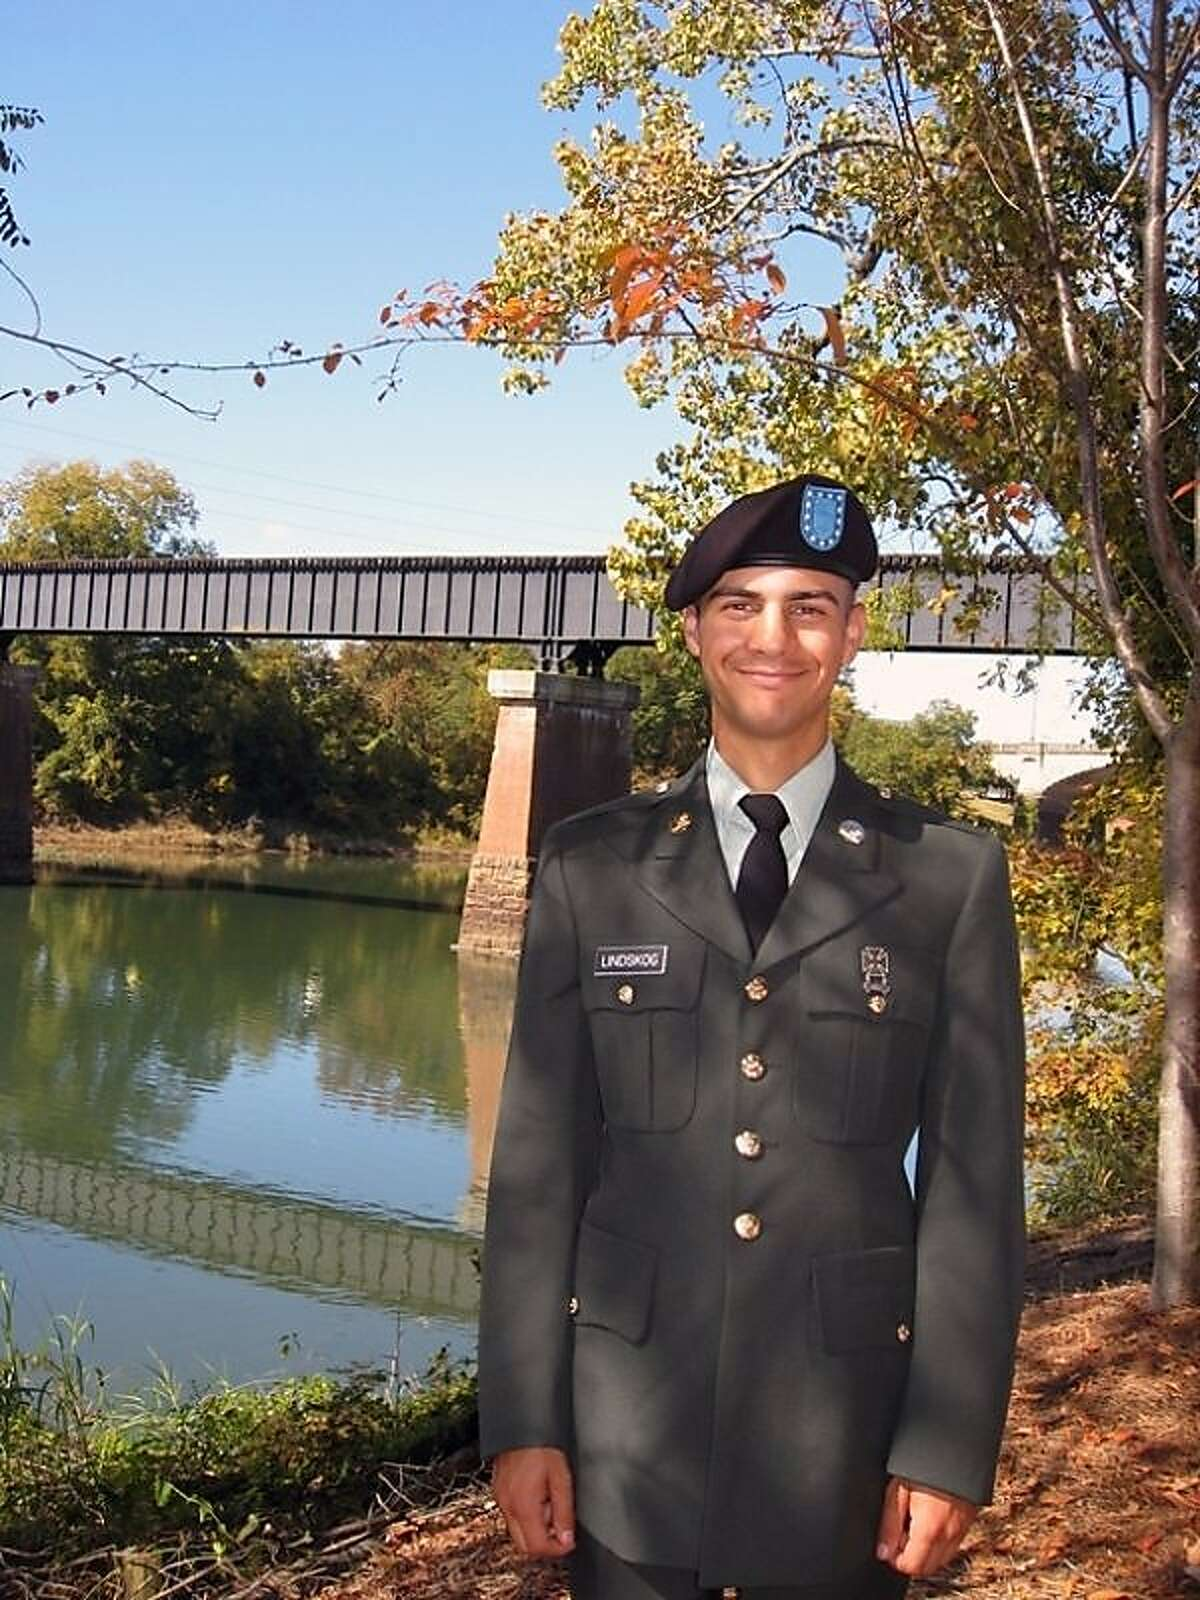 Army Spc. Jameson Lindskog, a medic killed in Afghanistan on March 29, 2011.